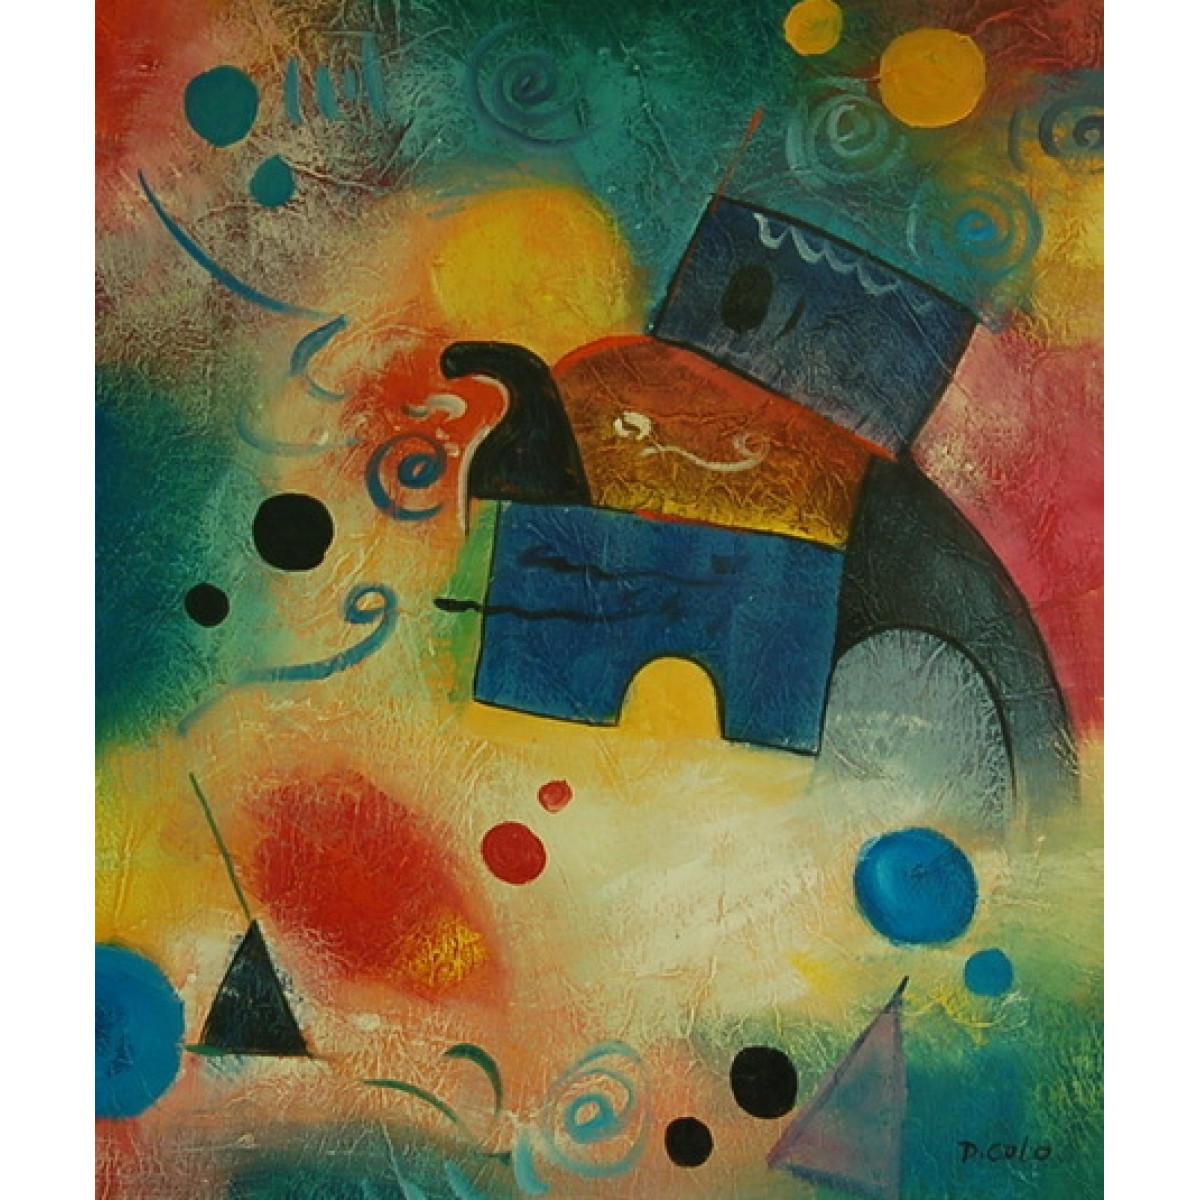 Картина Абстракция Слон, холст, масло, 50х60см